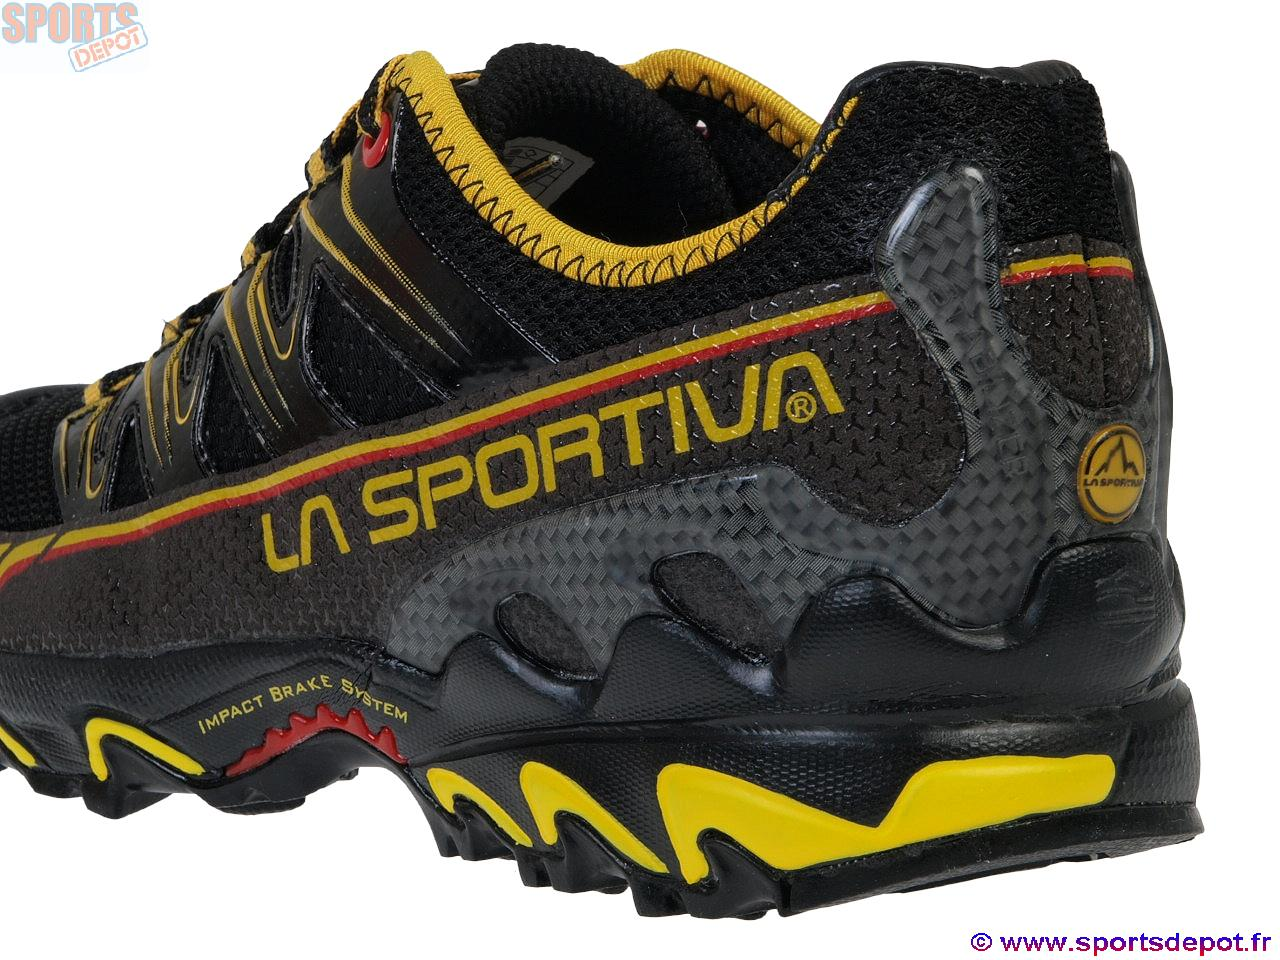 La Chaussures Ultra Noir Sportiva Raptor Trail Acheter Running PcvHqwxpc1